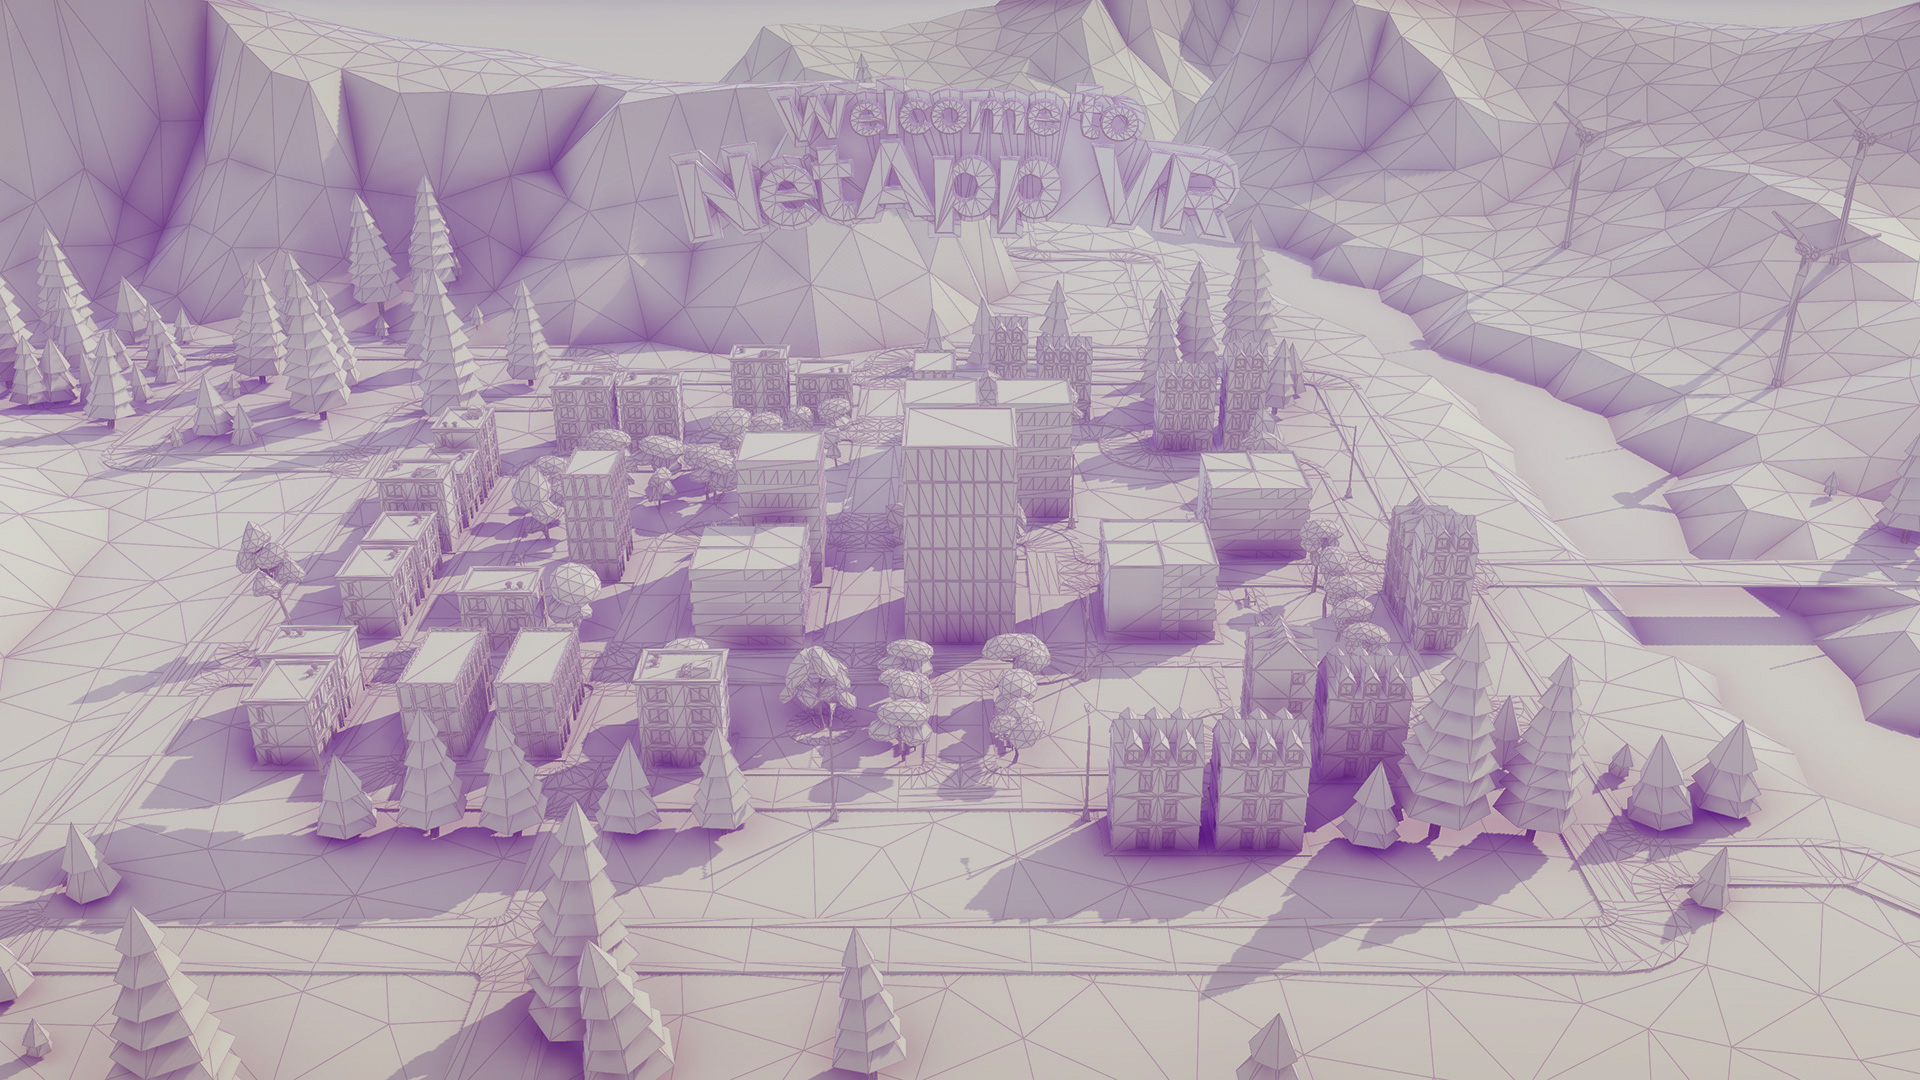 NetAppVR_Island_Wire.jpg